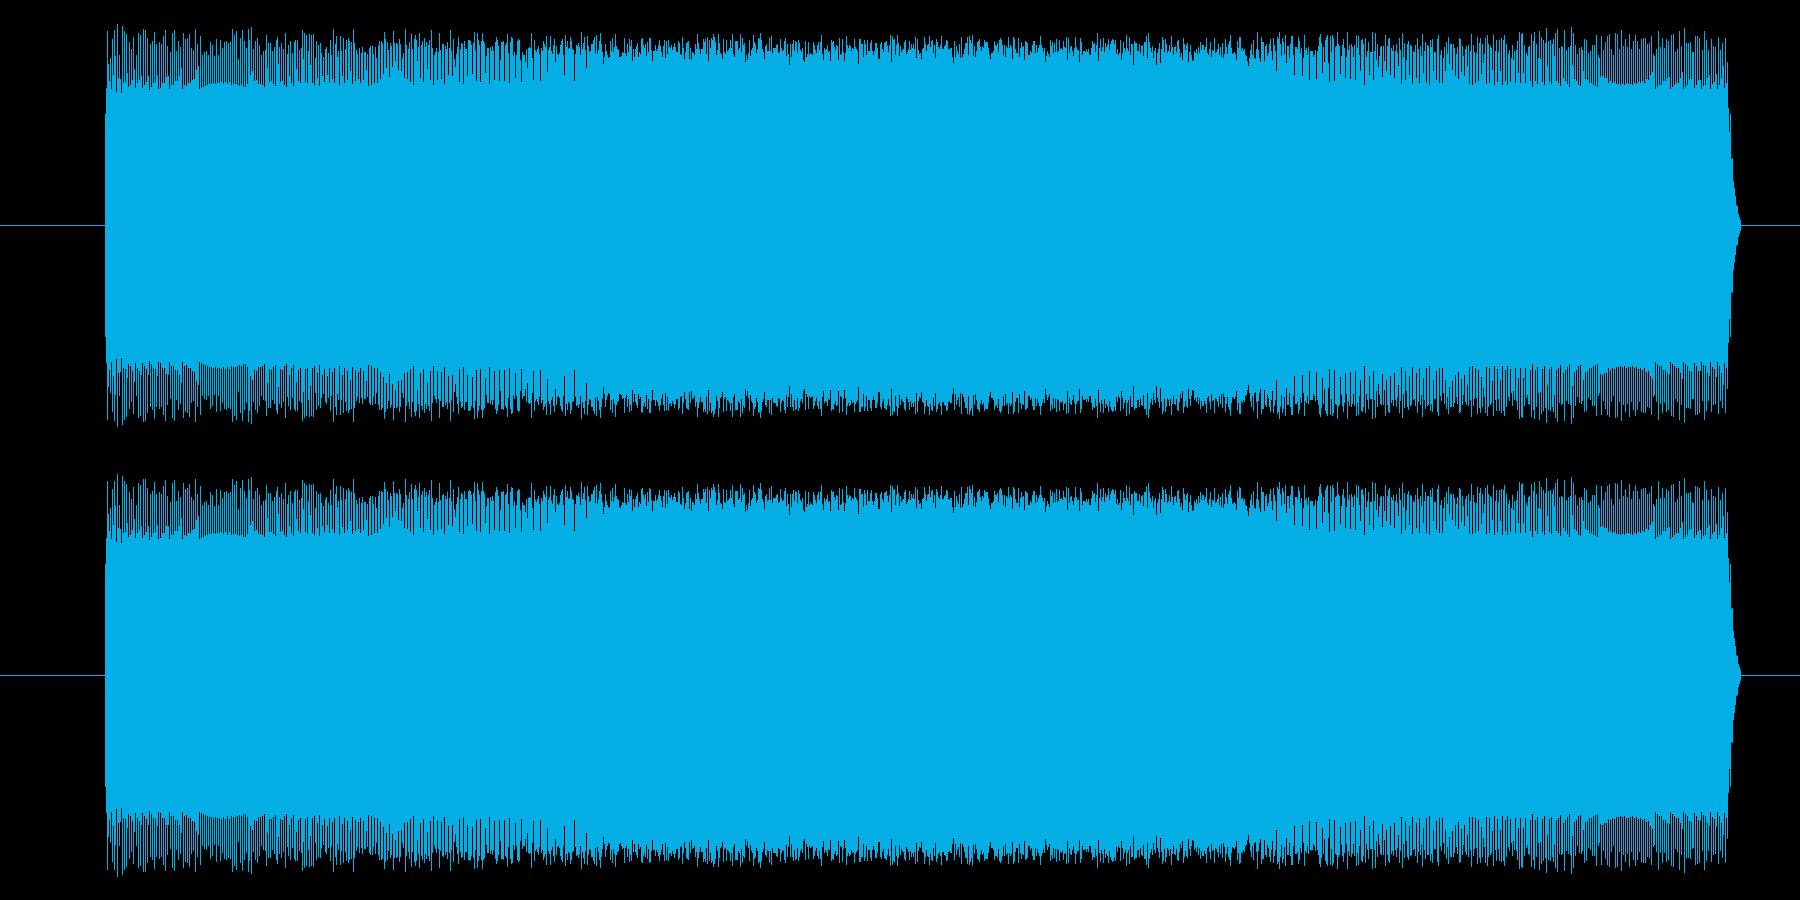 【NES 汎用01-16(スウィープ)】の再生済みの波形